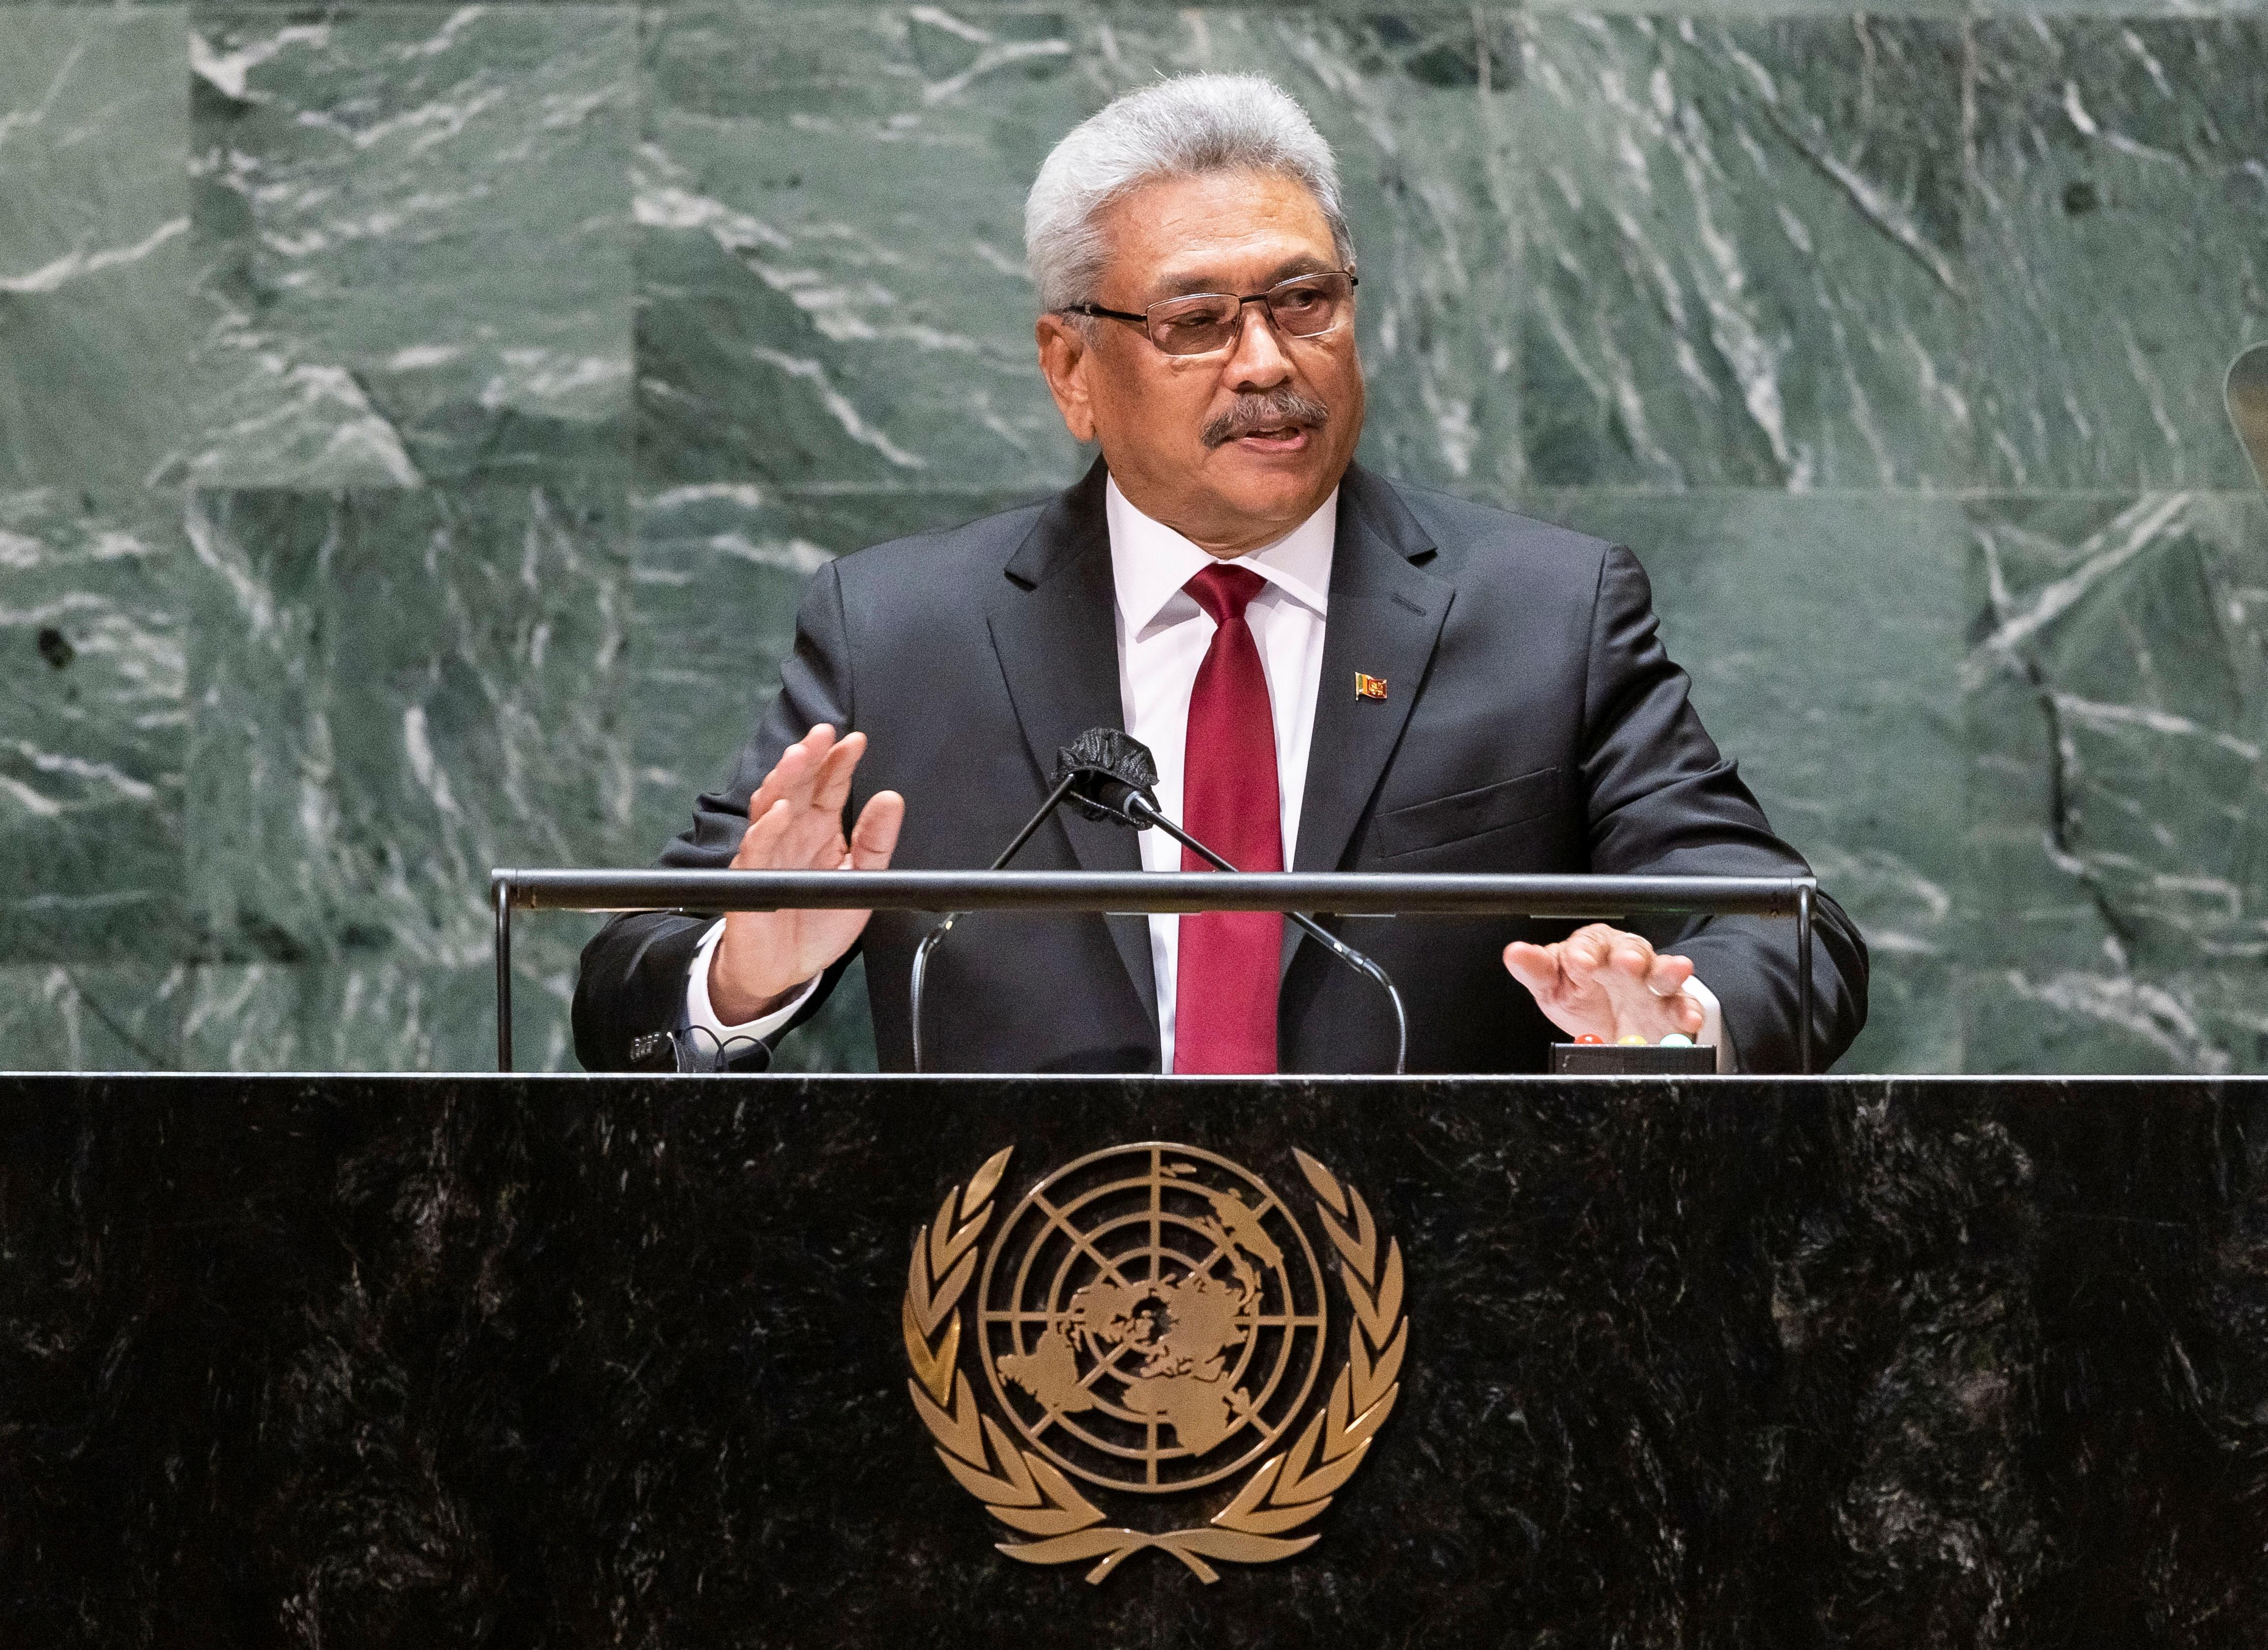 Sri Lanka's President Gotabaya Rajapaksa addresses the General Debate of the 76th Session of the United Nations General Assembly in New York City, U.S., September 22, 2021. Justin Lane/Pool via REUTERS